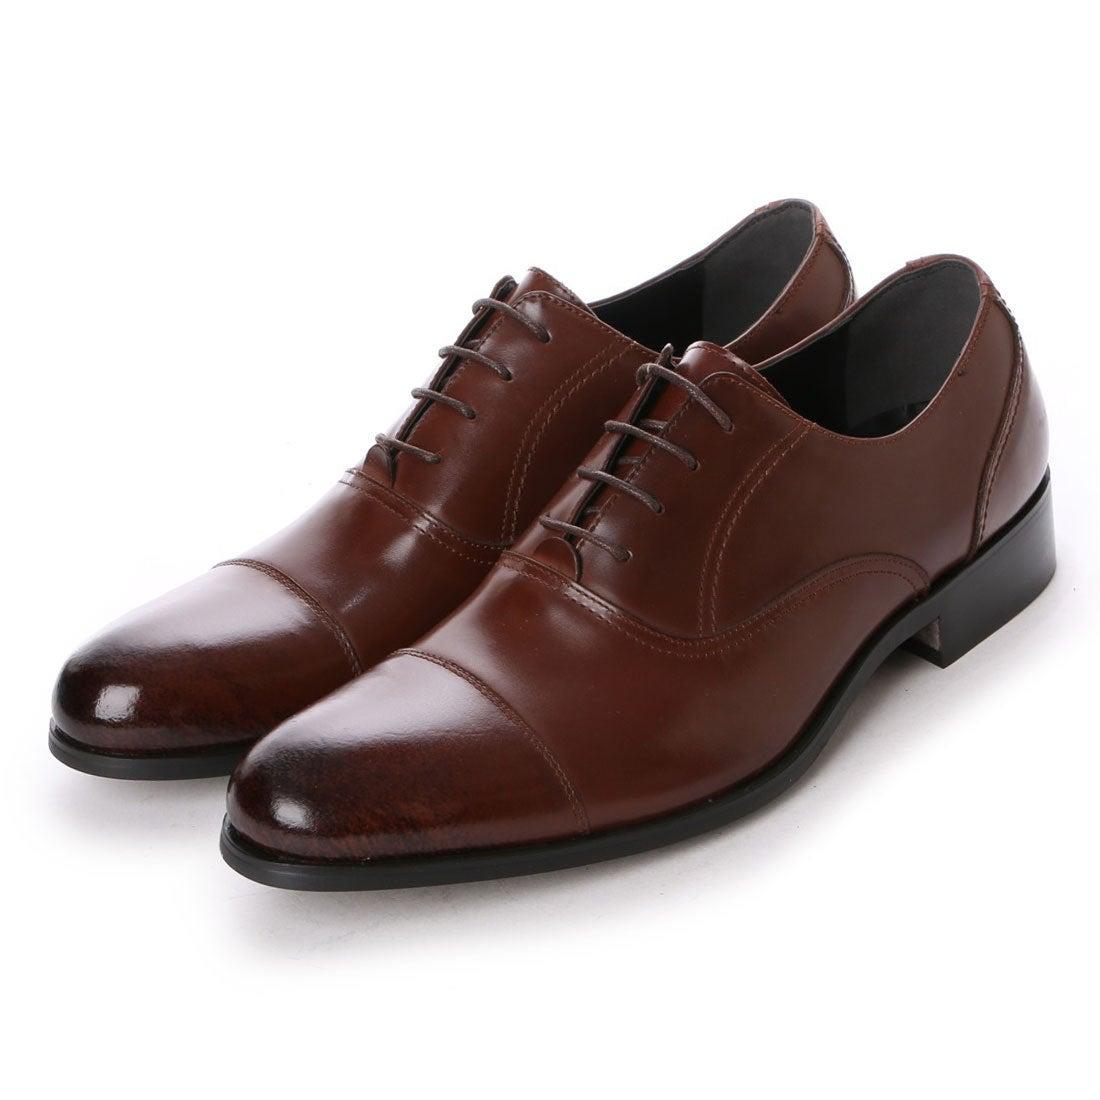 fd790a4e51dd2 パーソンズ フォー パーソンズ person s for person s ストレートチップE700 (ダークブラウン) -靴&ファッション通販  ロコンド〜自宅で試着、気軽に返品